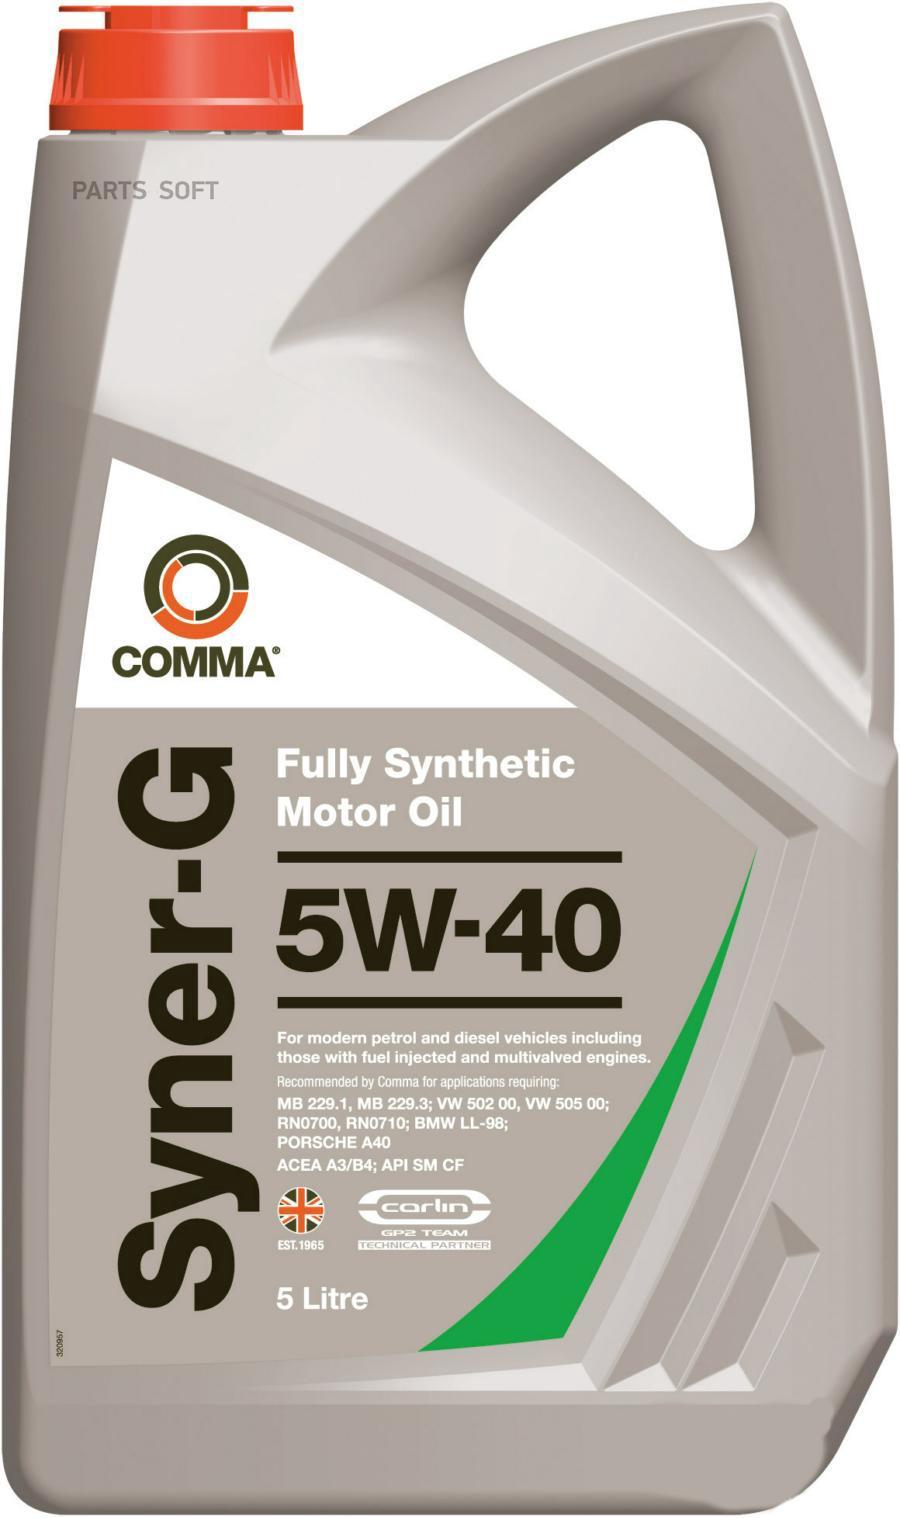 Масло моторное Syner-G 5W-40 (ACEA A3/B4, API SN CF) 5л COMMA SYN5L